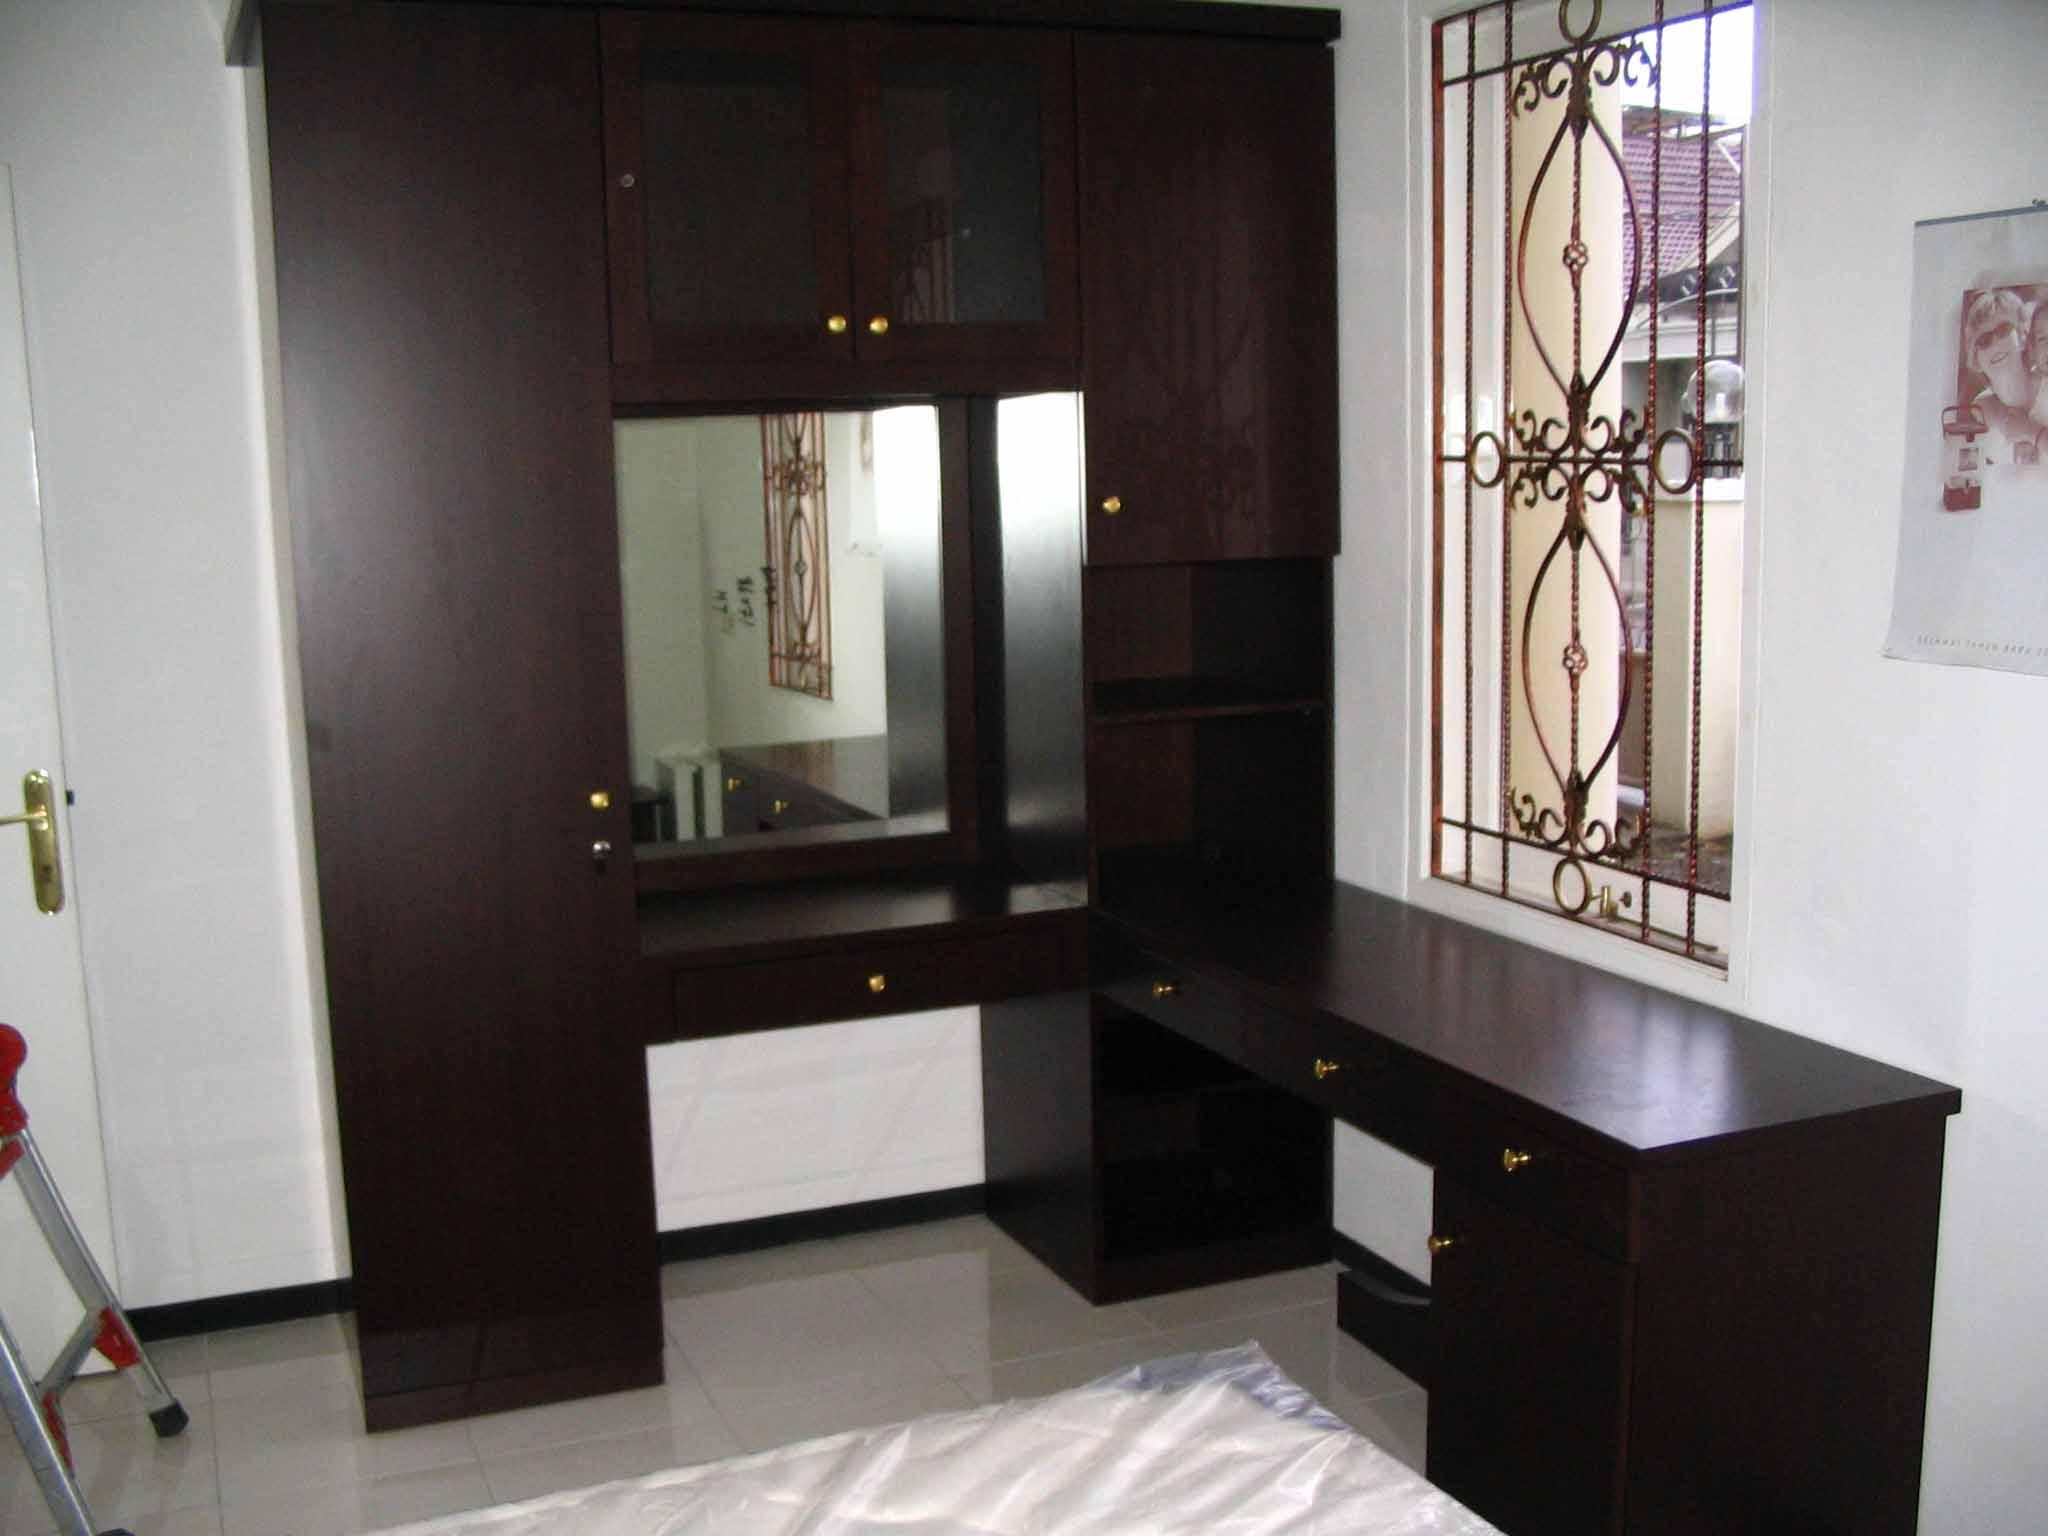 Furniture Mebel Interior Arsitektur Renovasi Design Rumah  # Meuble Tv Design Ked